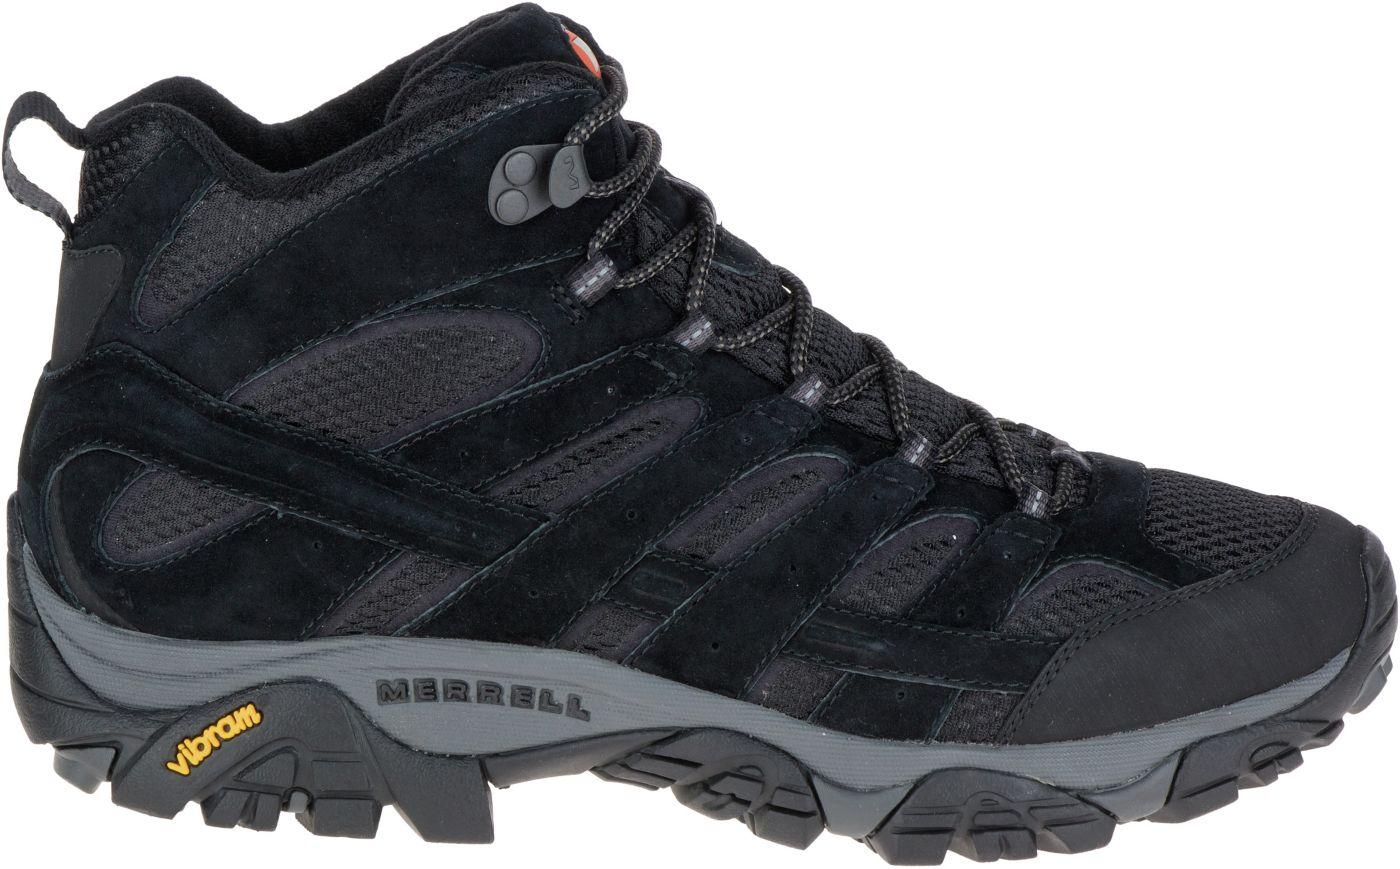 Merrell Men's Moab 2 Ventilator Mid Hiking Boots